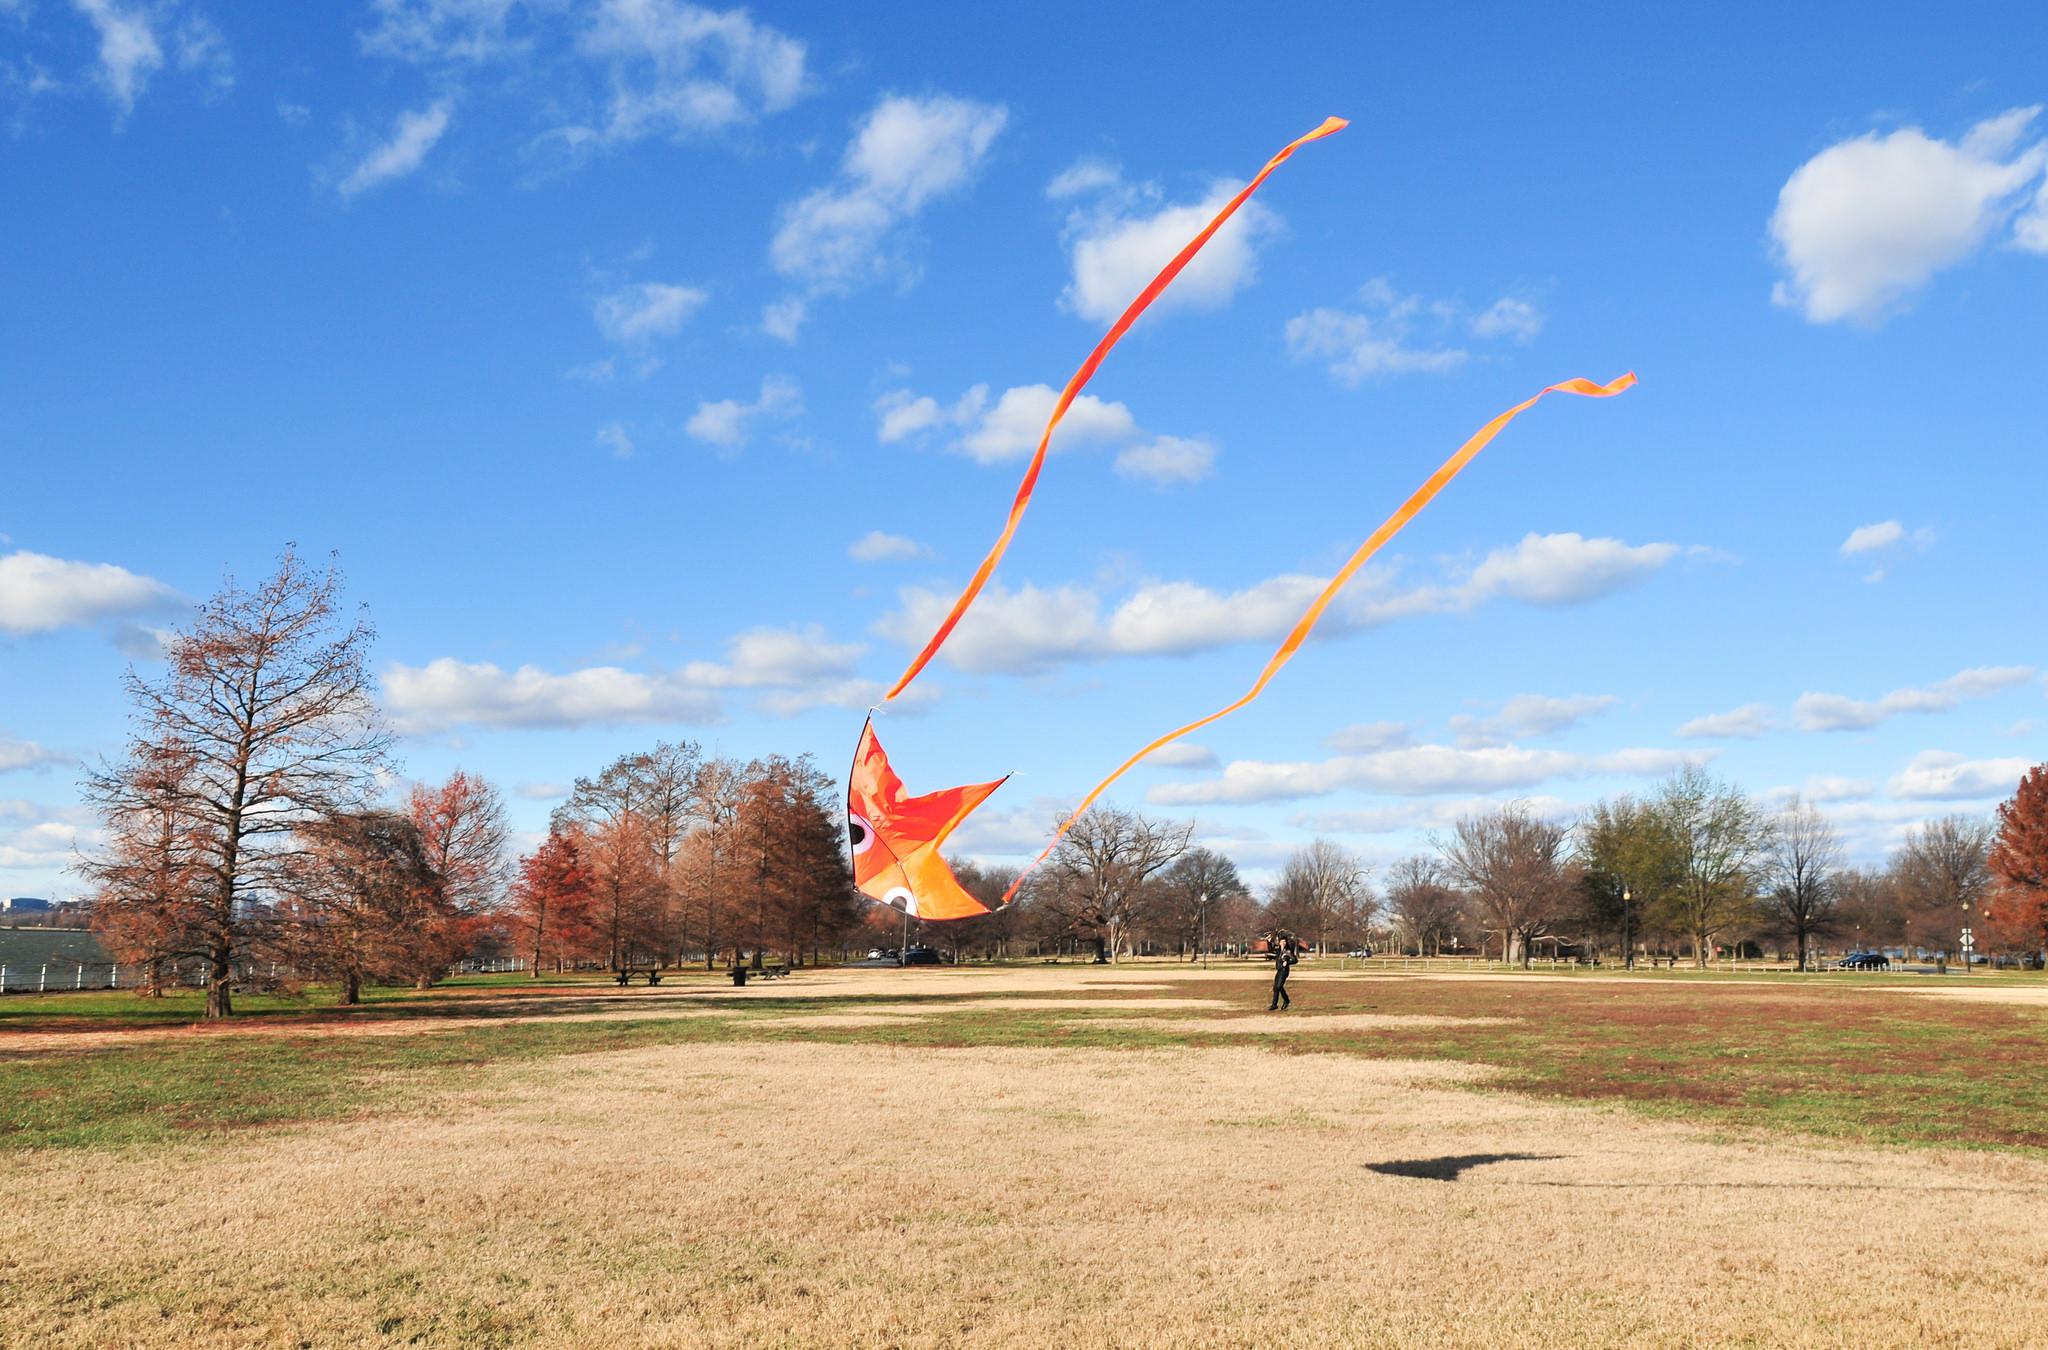 Christmas Day Kite by John Leszczynski